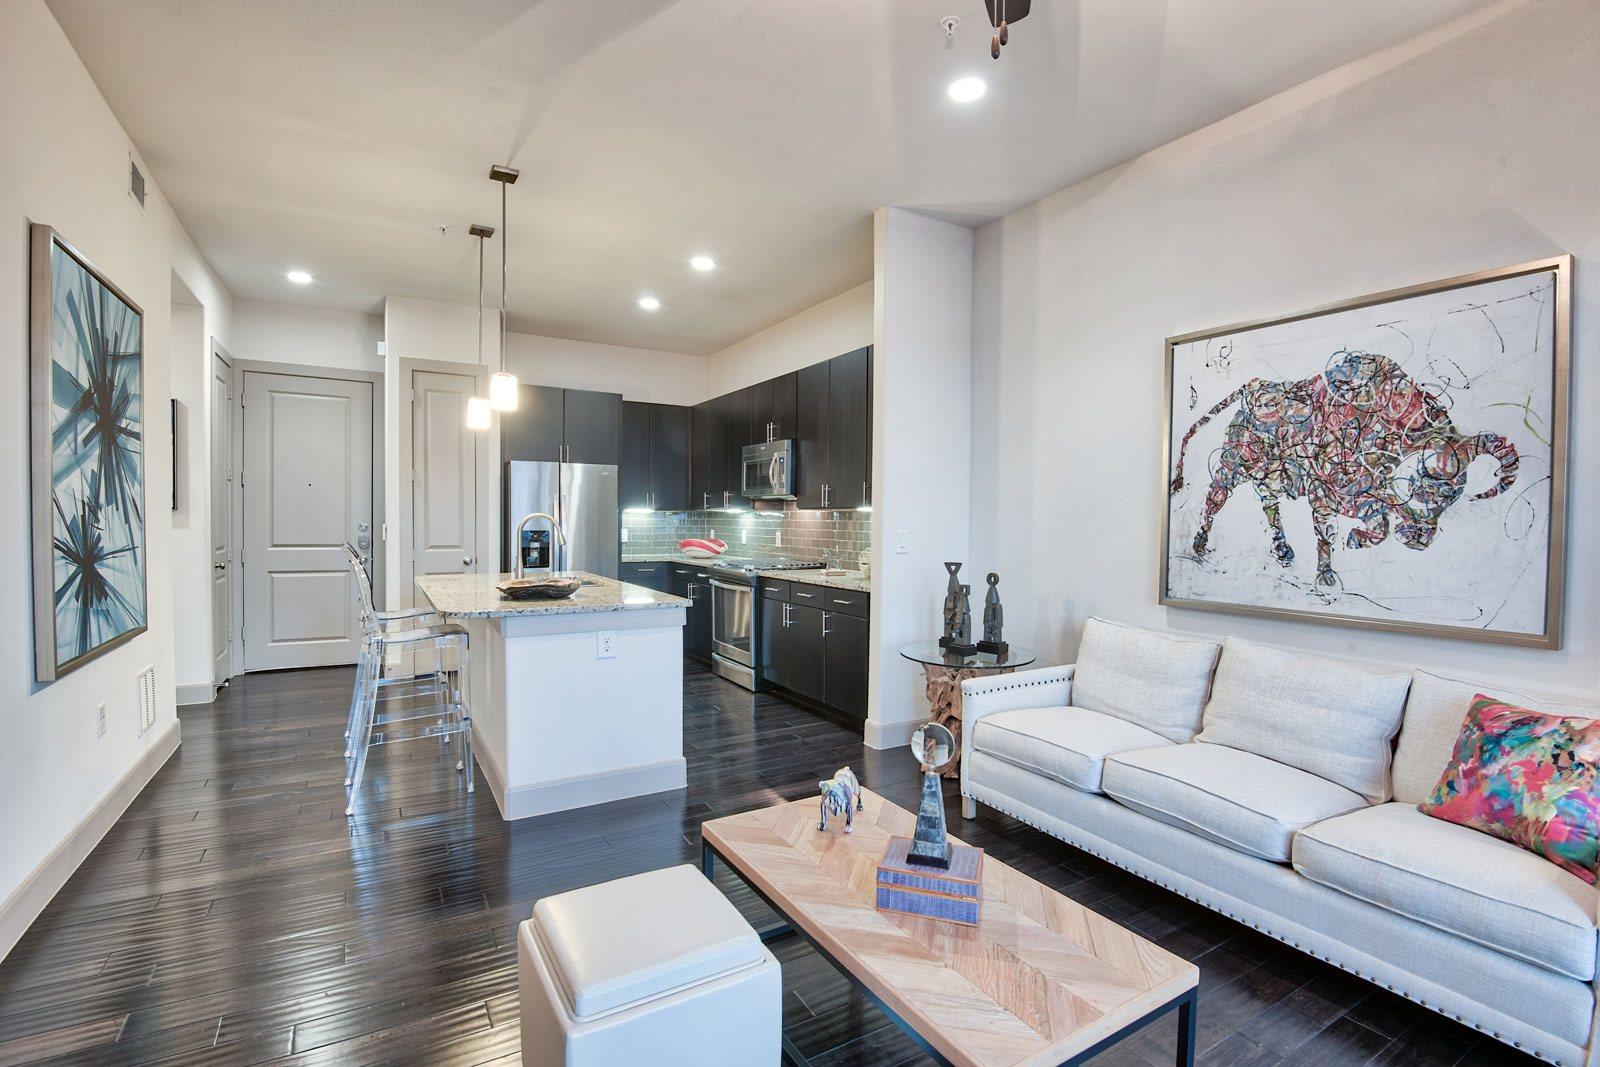 Hardwood Floors at Midtown Houston by Windsor, 2310 Main Street, Houston